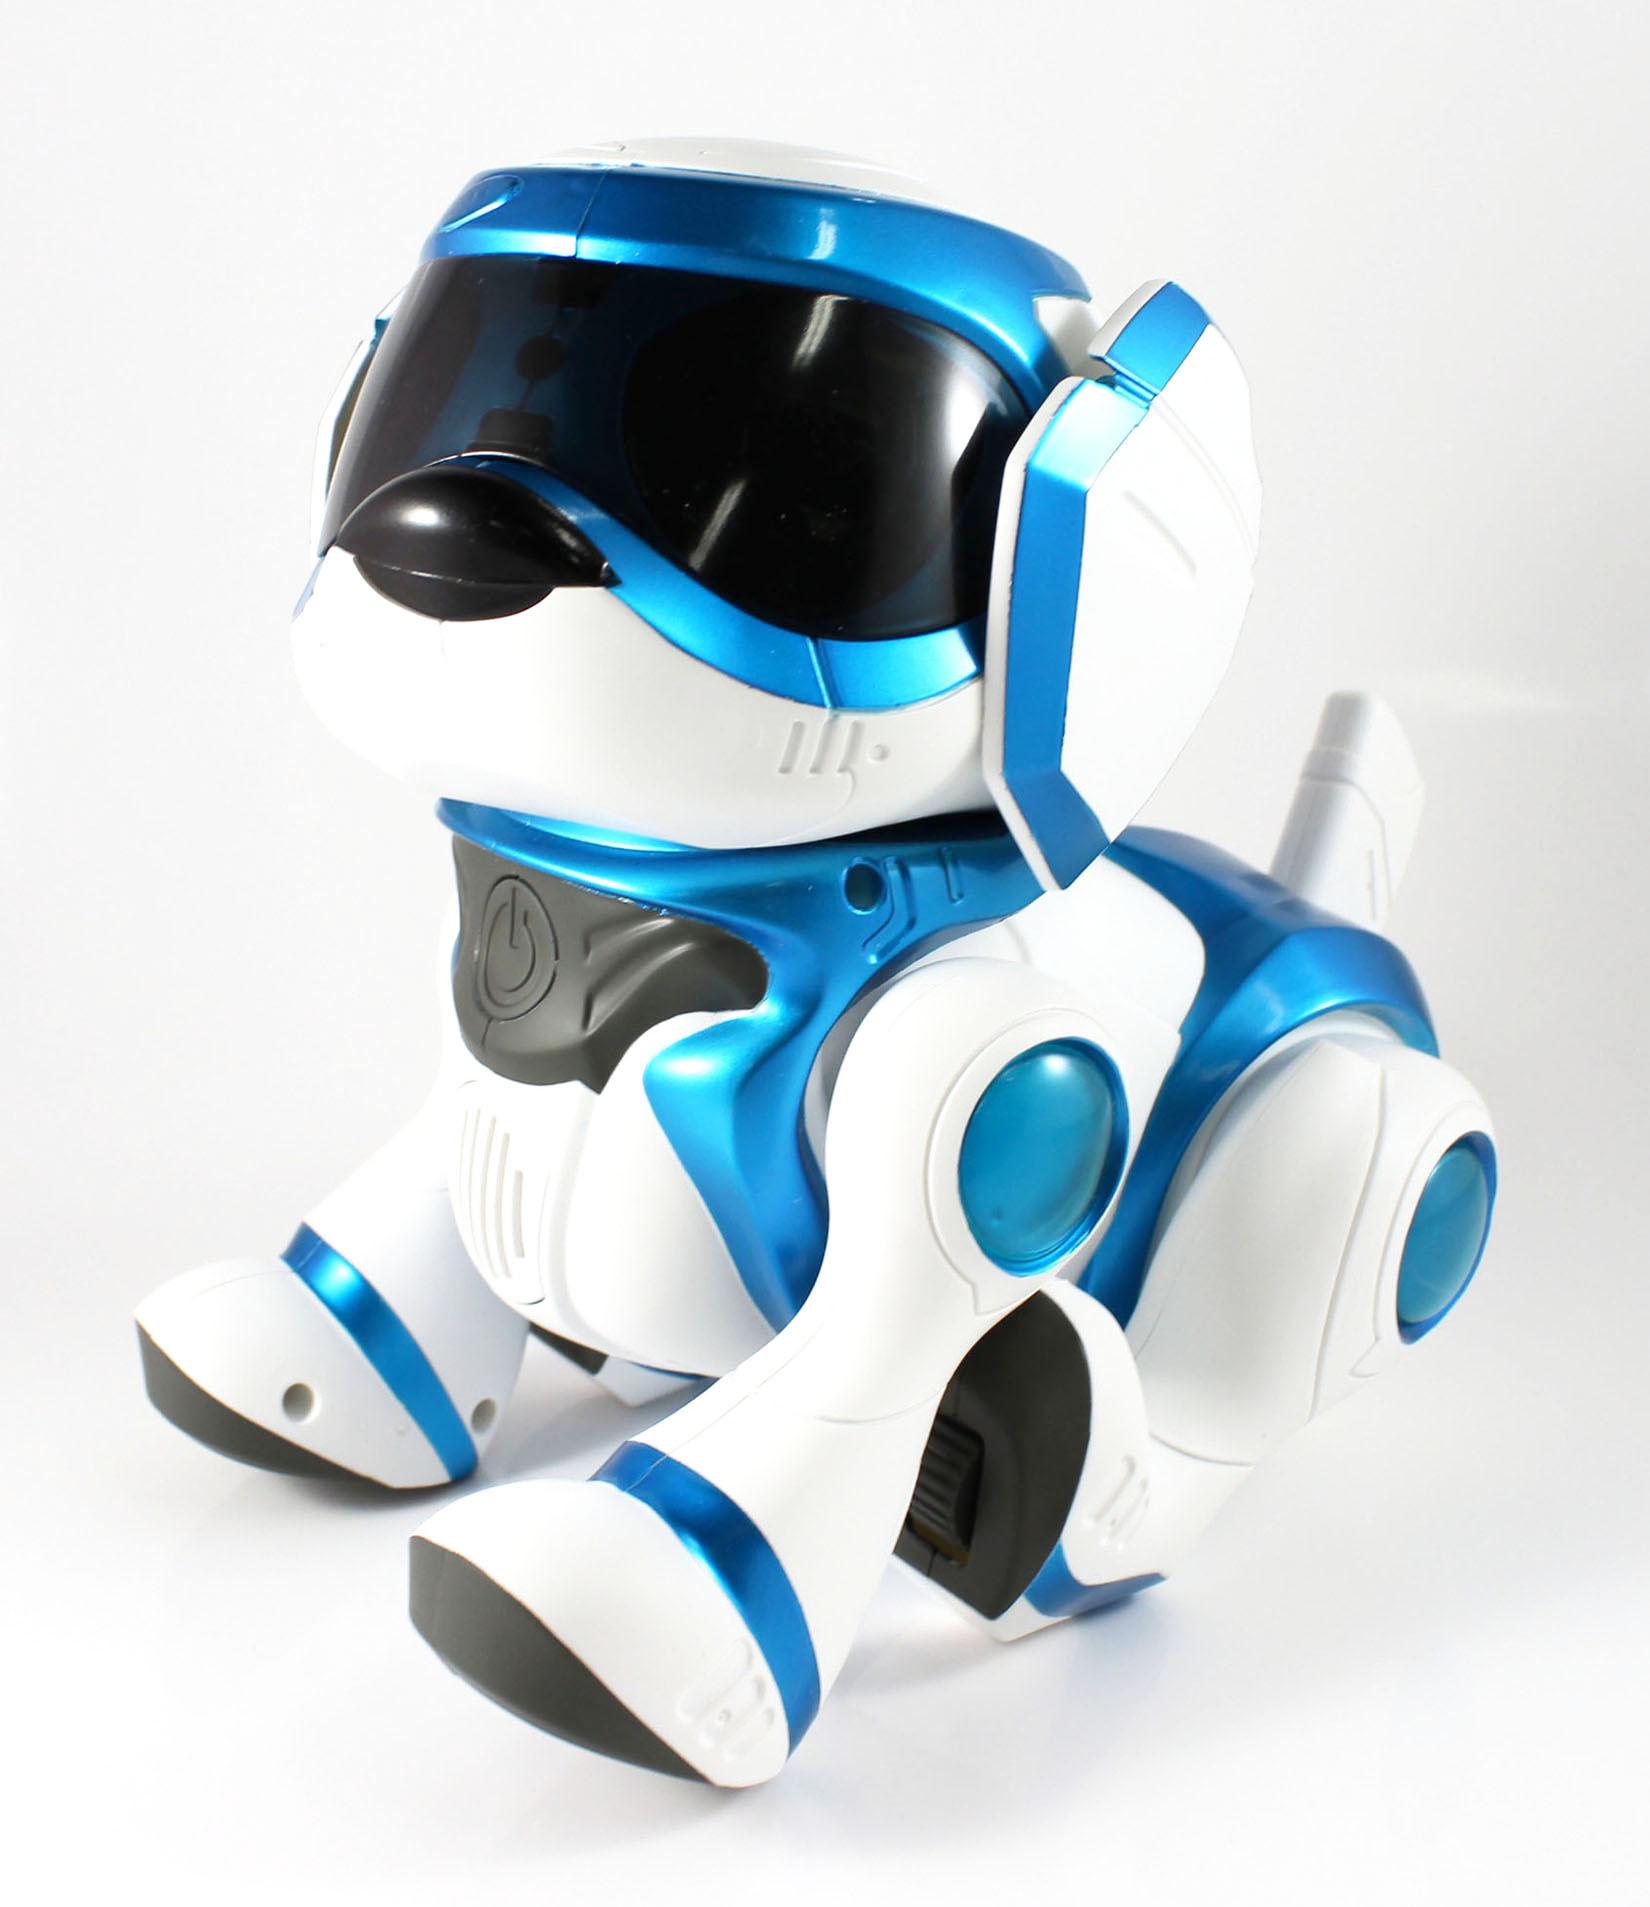 Amazon.com: Tekno Dog - Beagle: Toys & Games